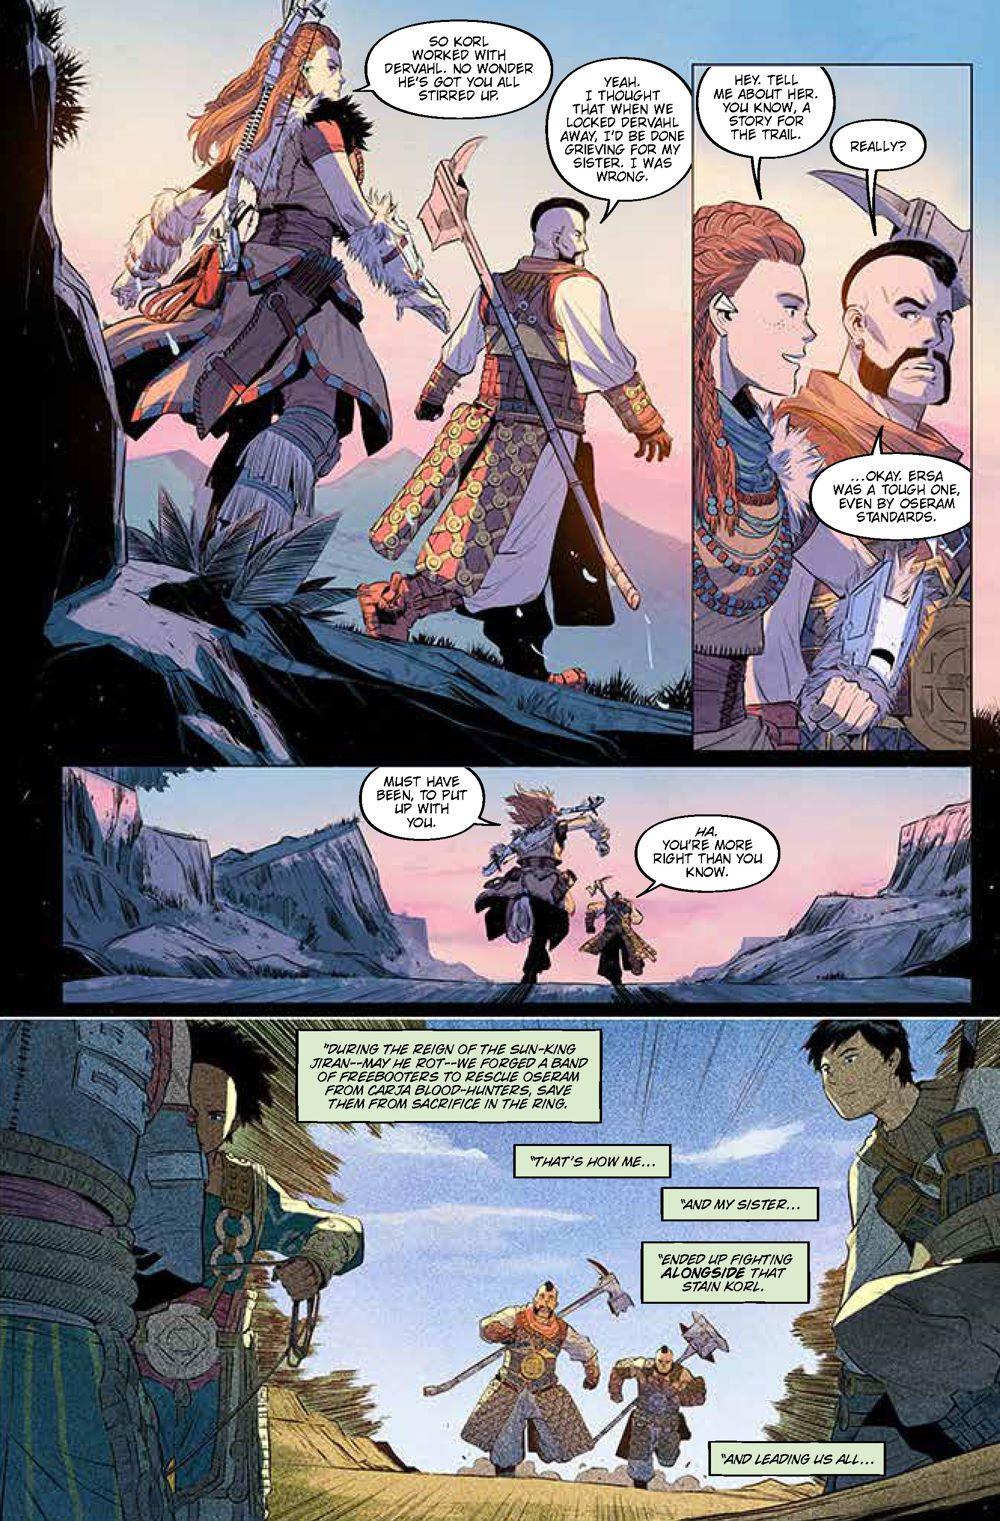 Pages-from-HorizonZeroDawn2.1_2 ComicList Previews: HORIZON ZERO DAWN LIBERATION #1